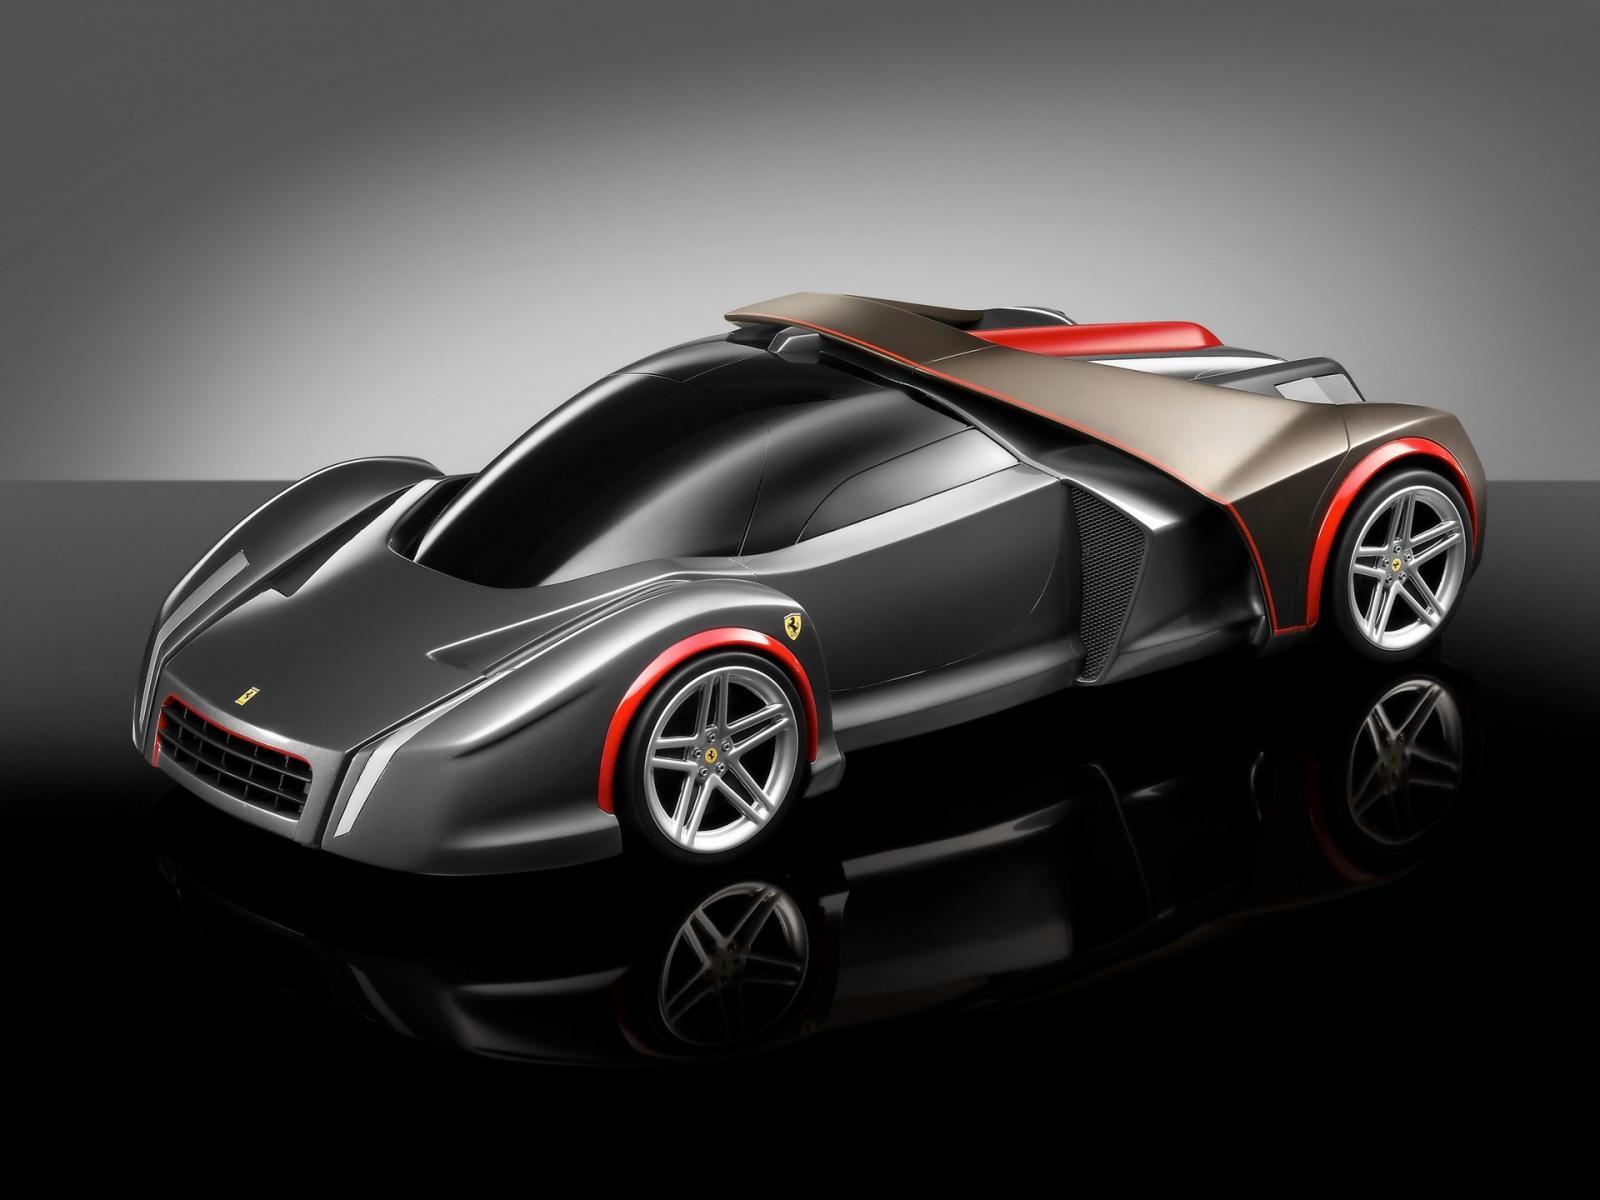 Ferrari Cars Hd Wallpapers Best Size 1080p Free Download